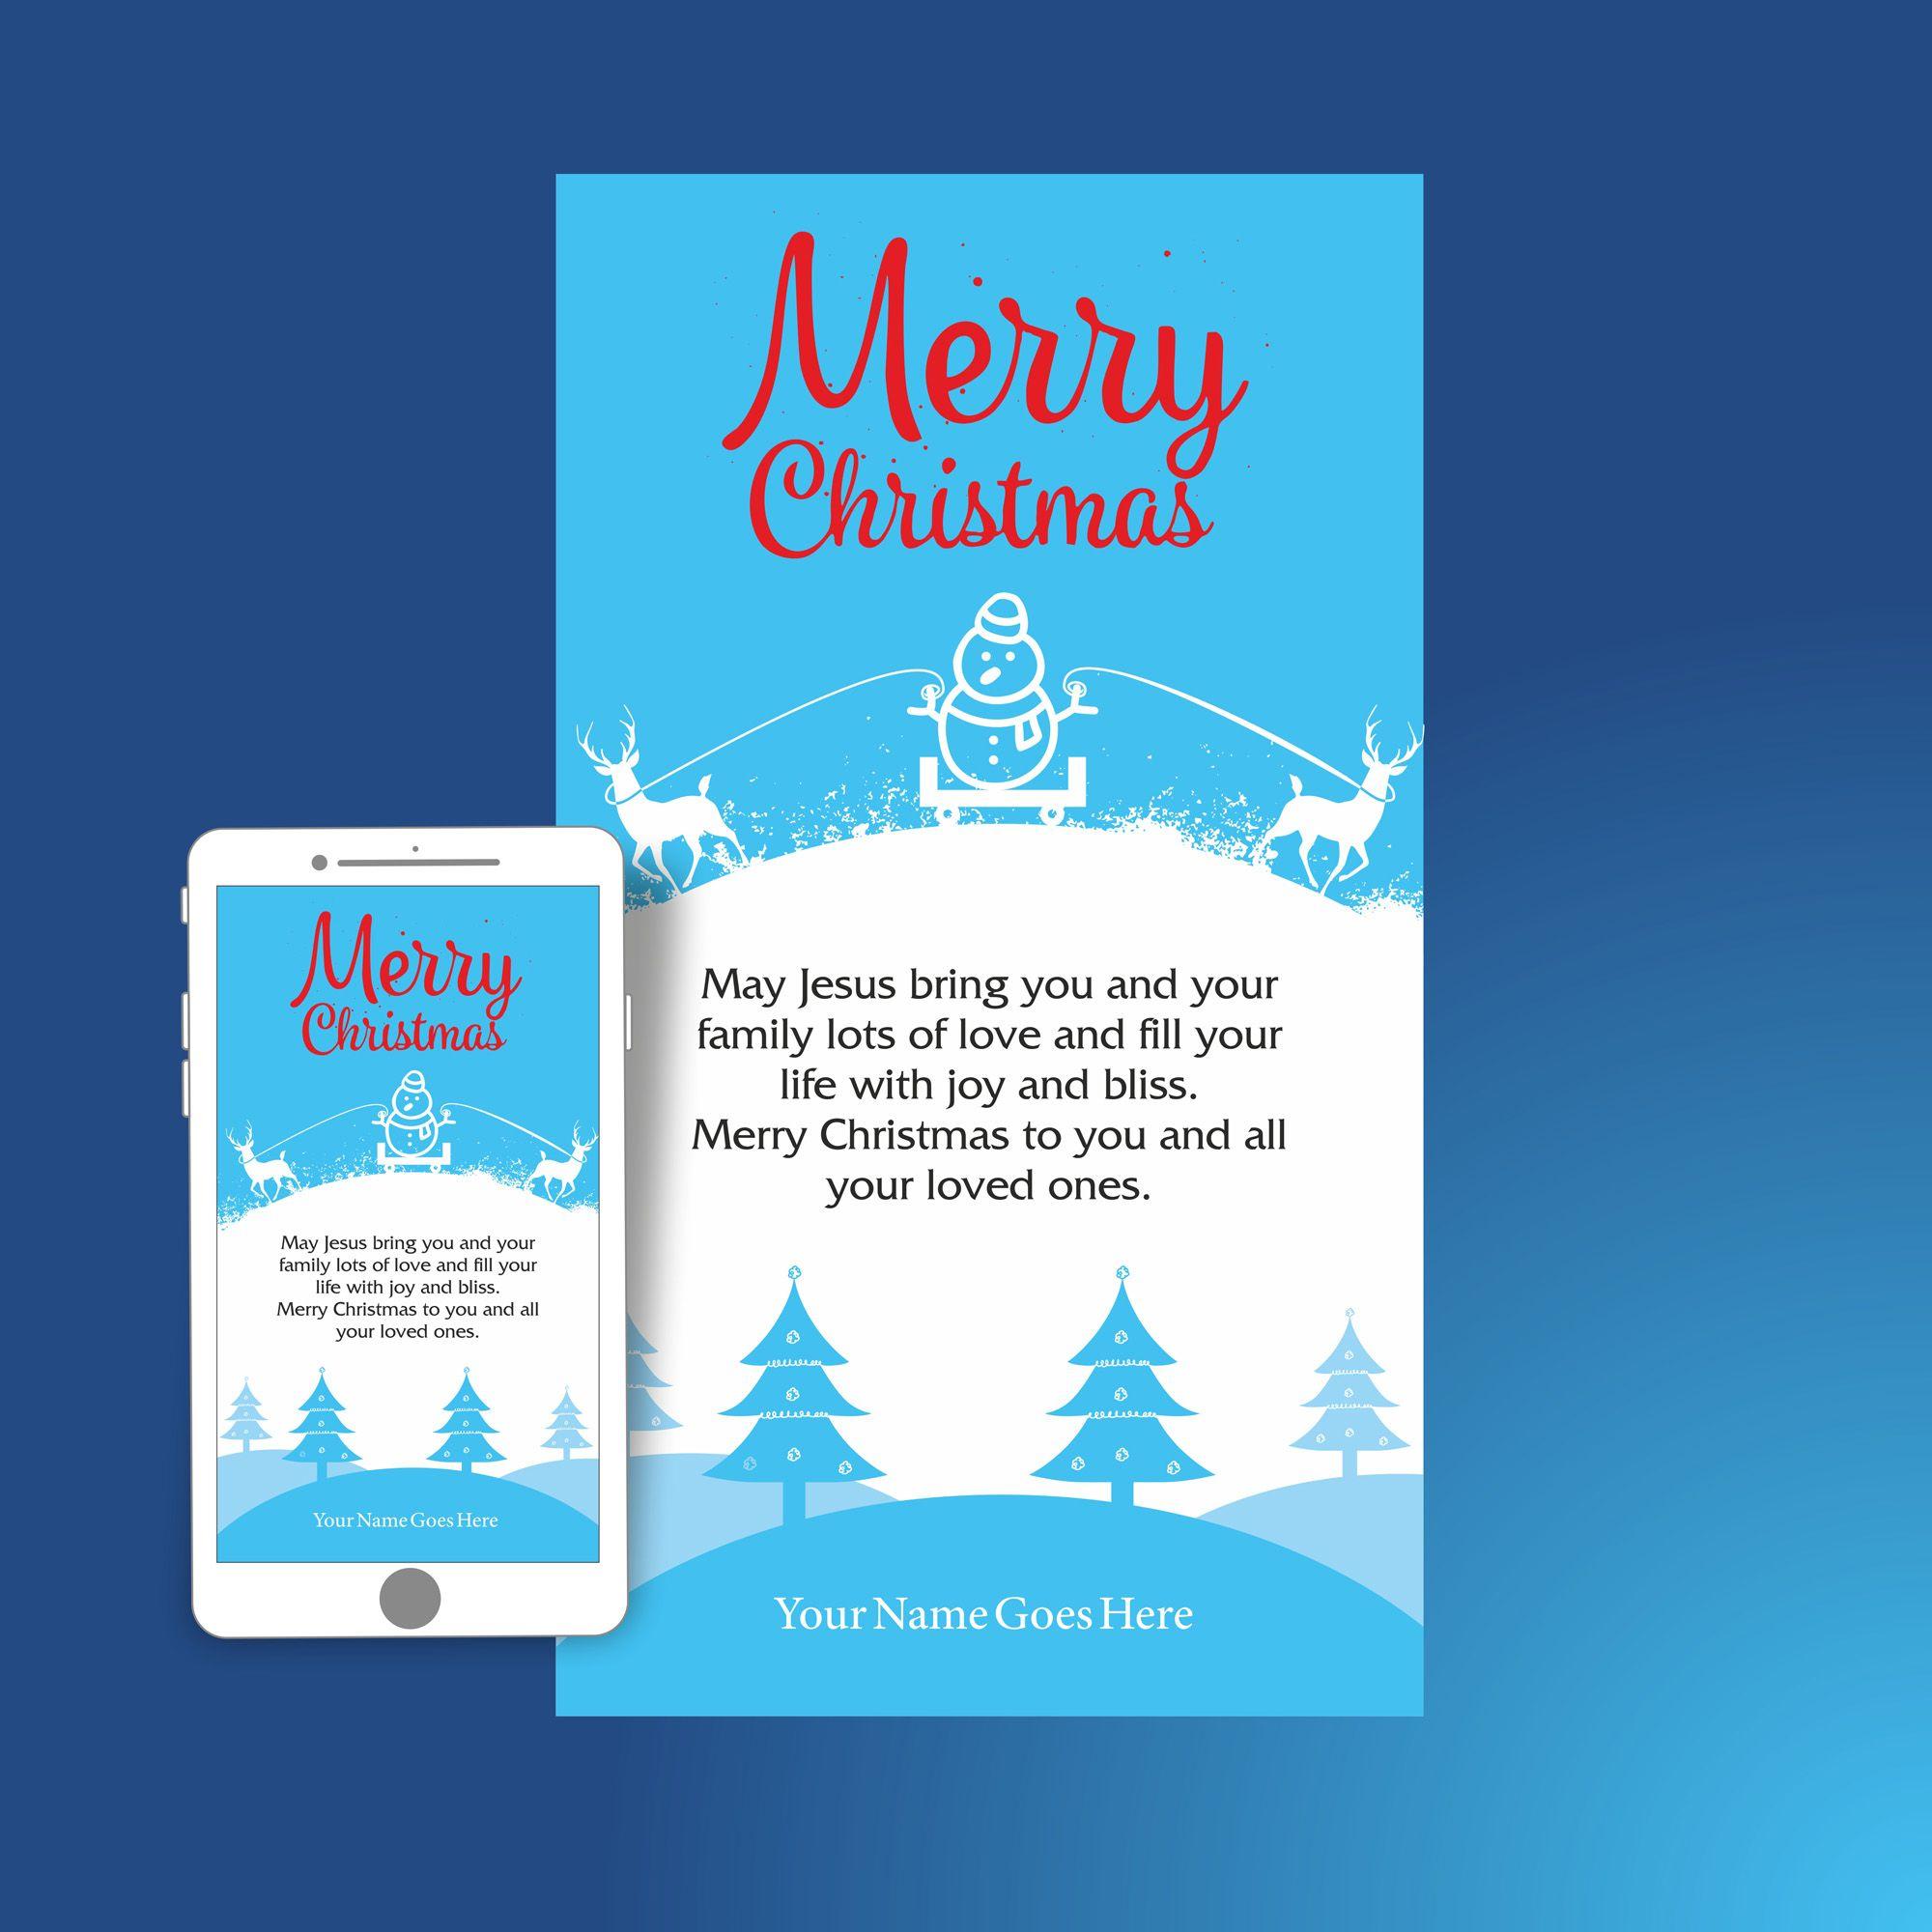 Xmas Greeting Xmas greetings, Xmas greeting cards, Greetings